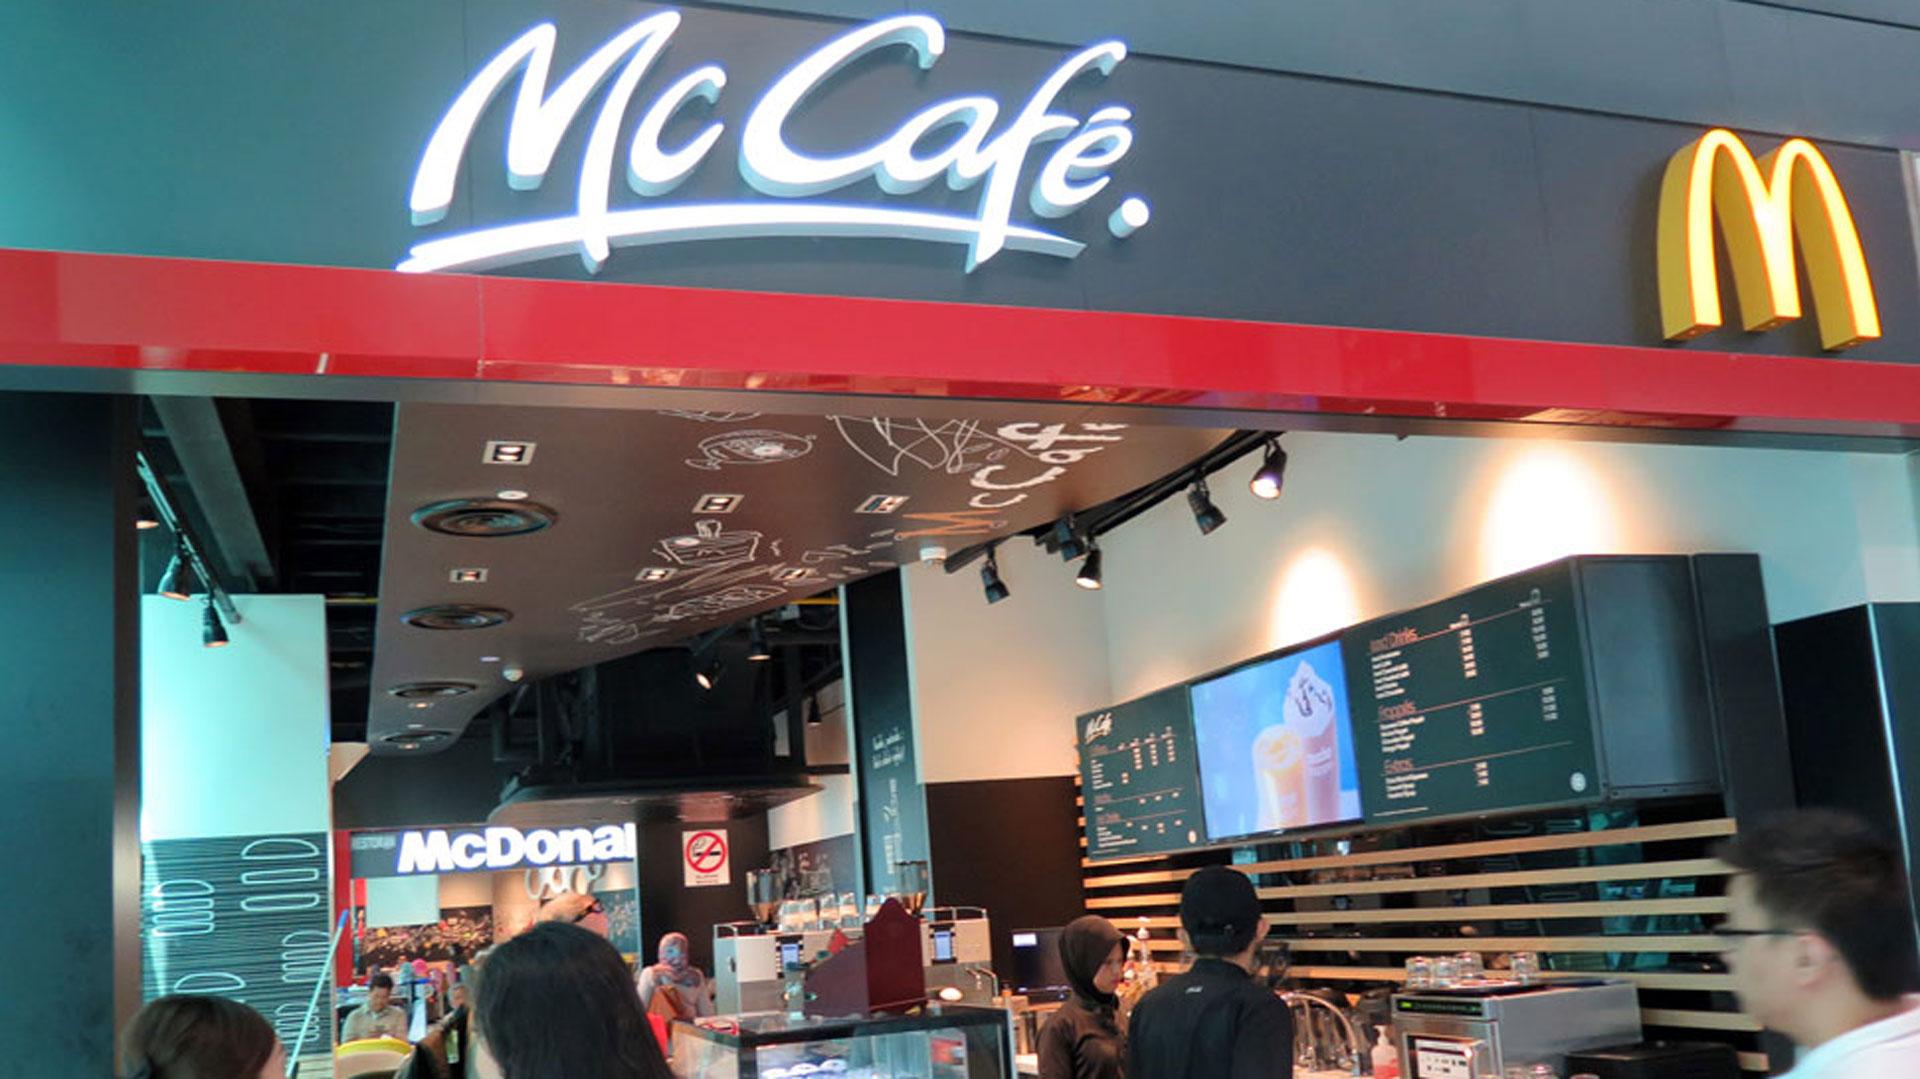 Maccal 9700 Pro